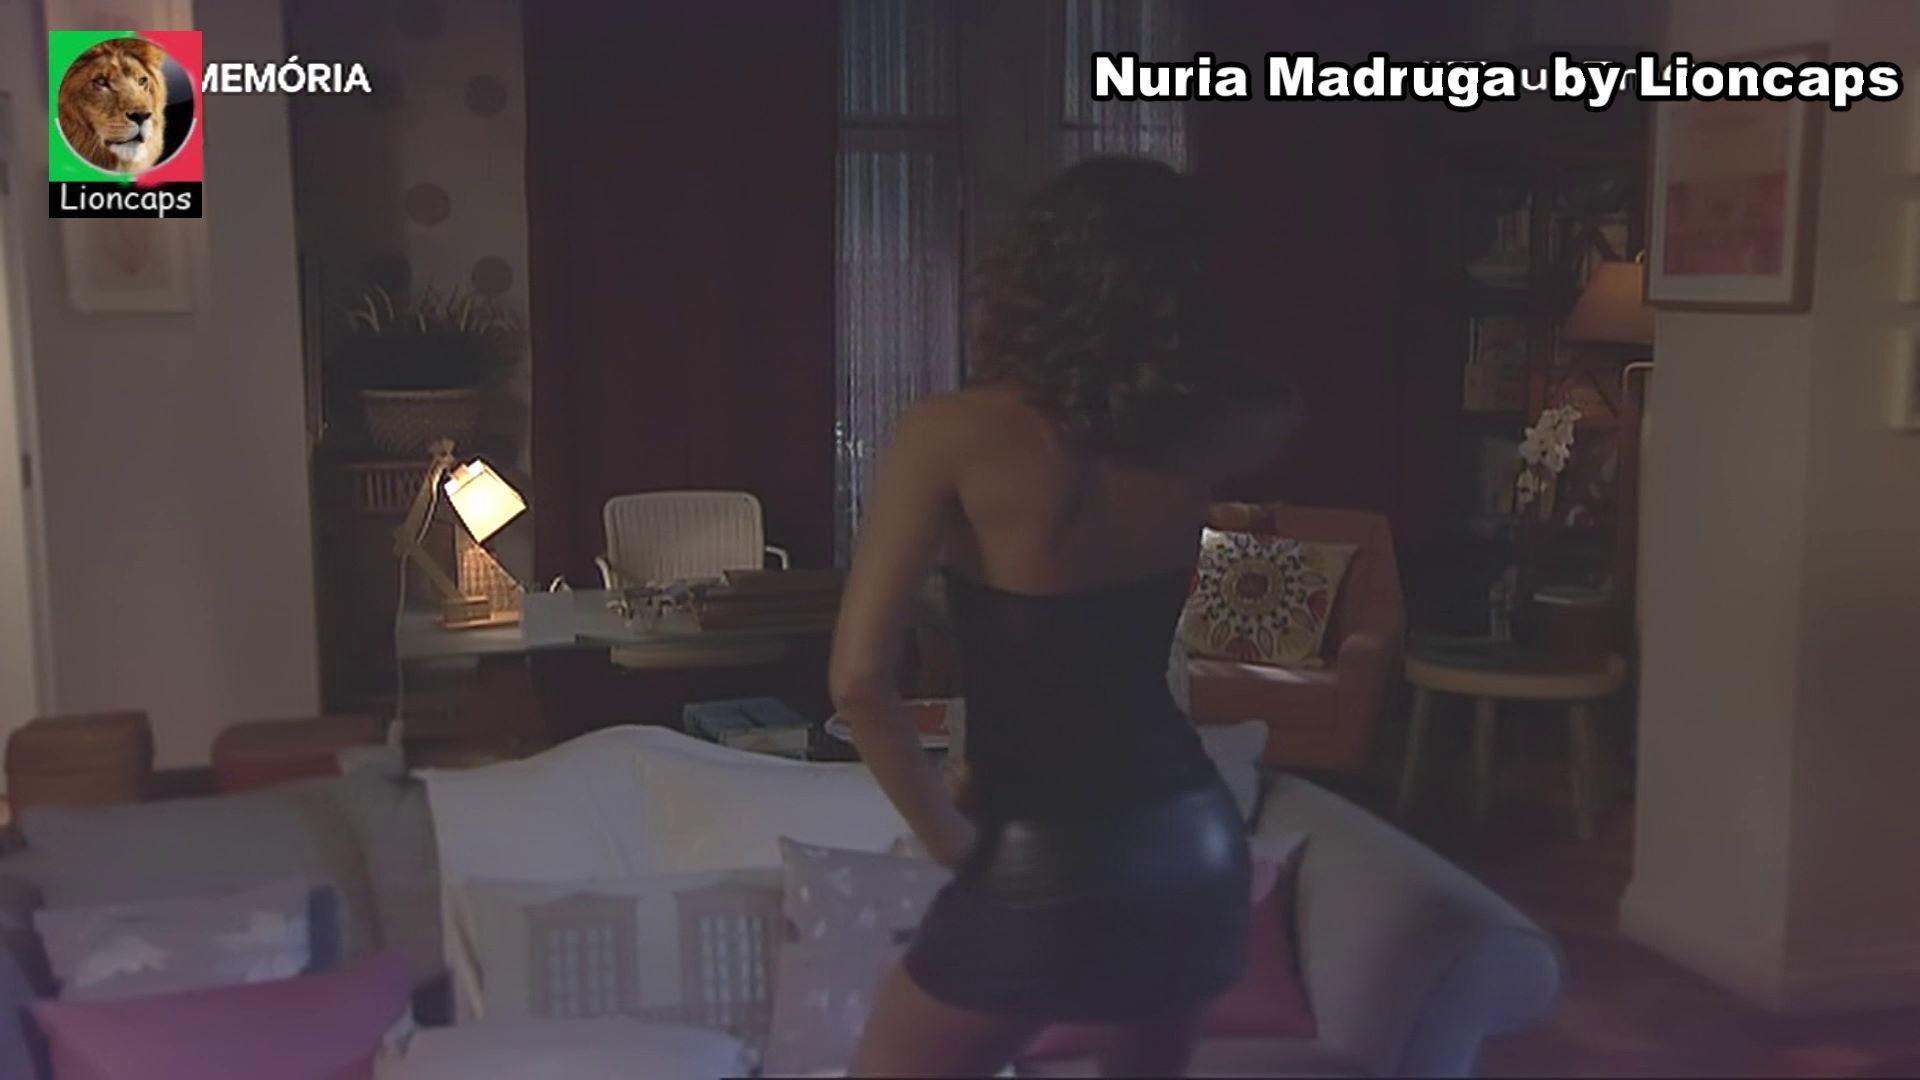 nuria_madruga_vs200421-001 (6).JPG